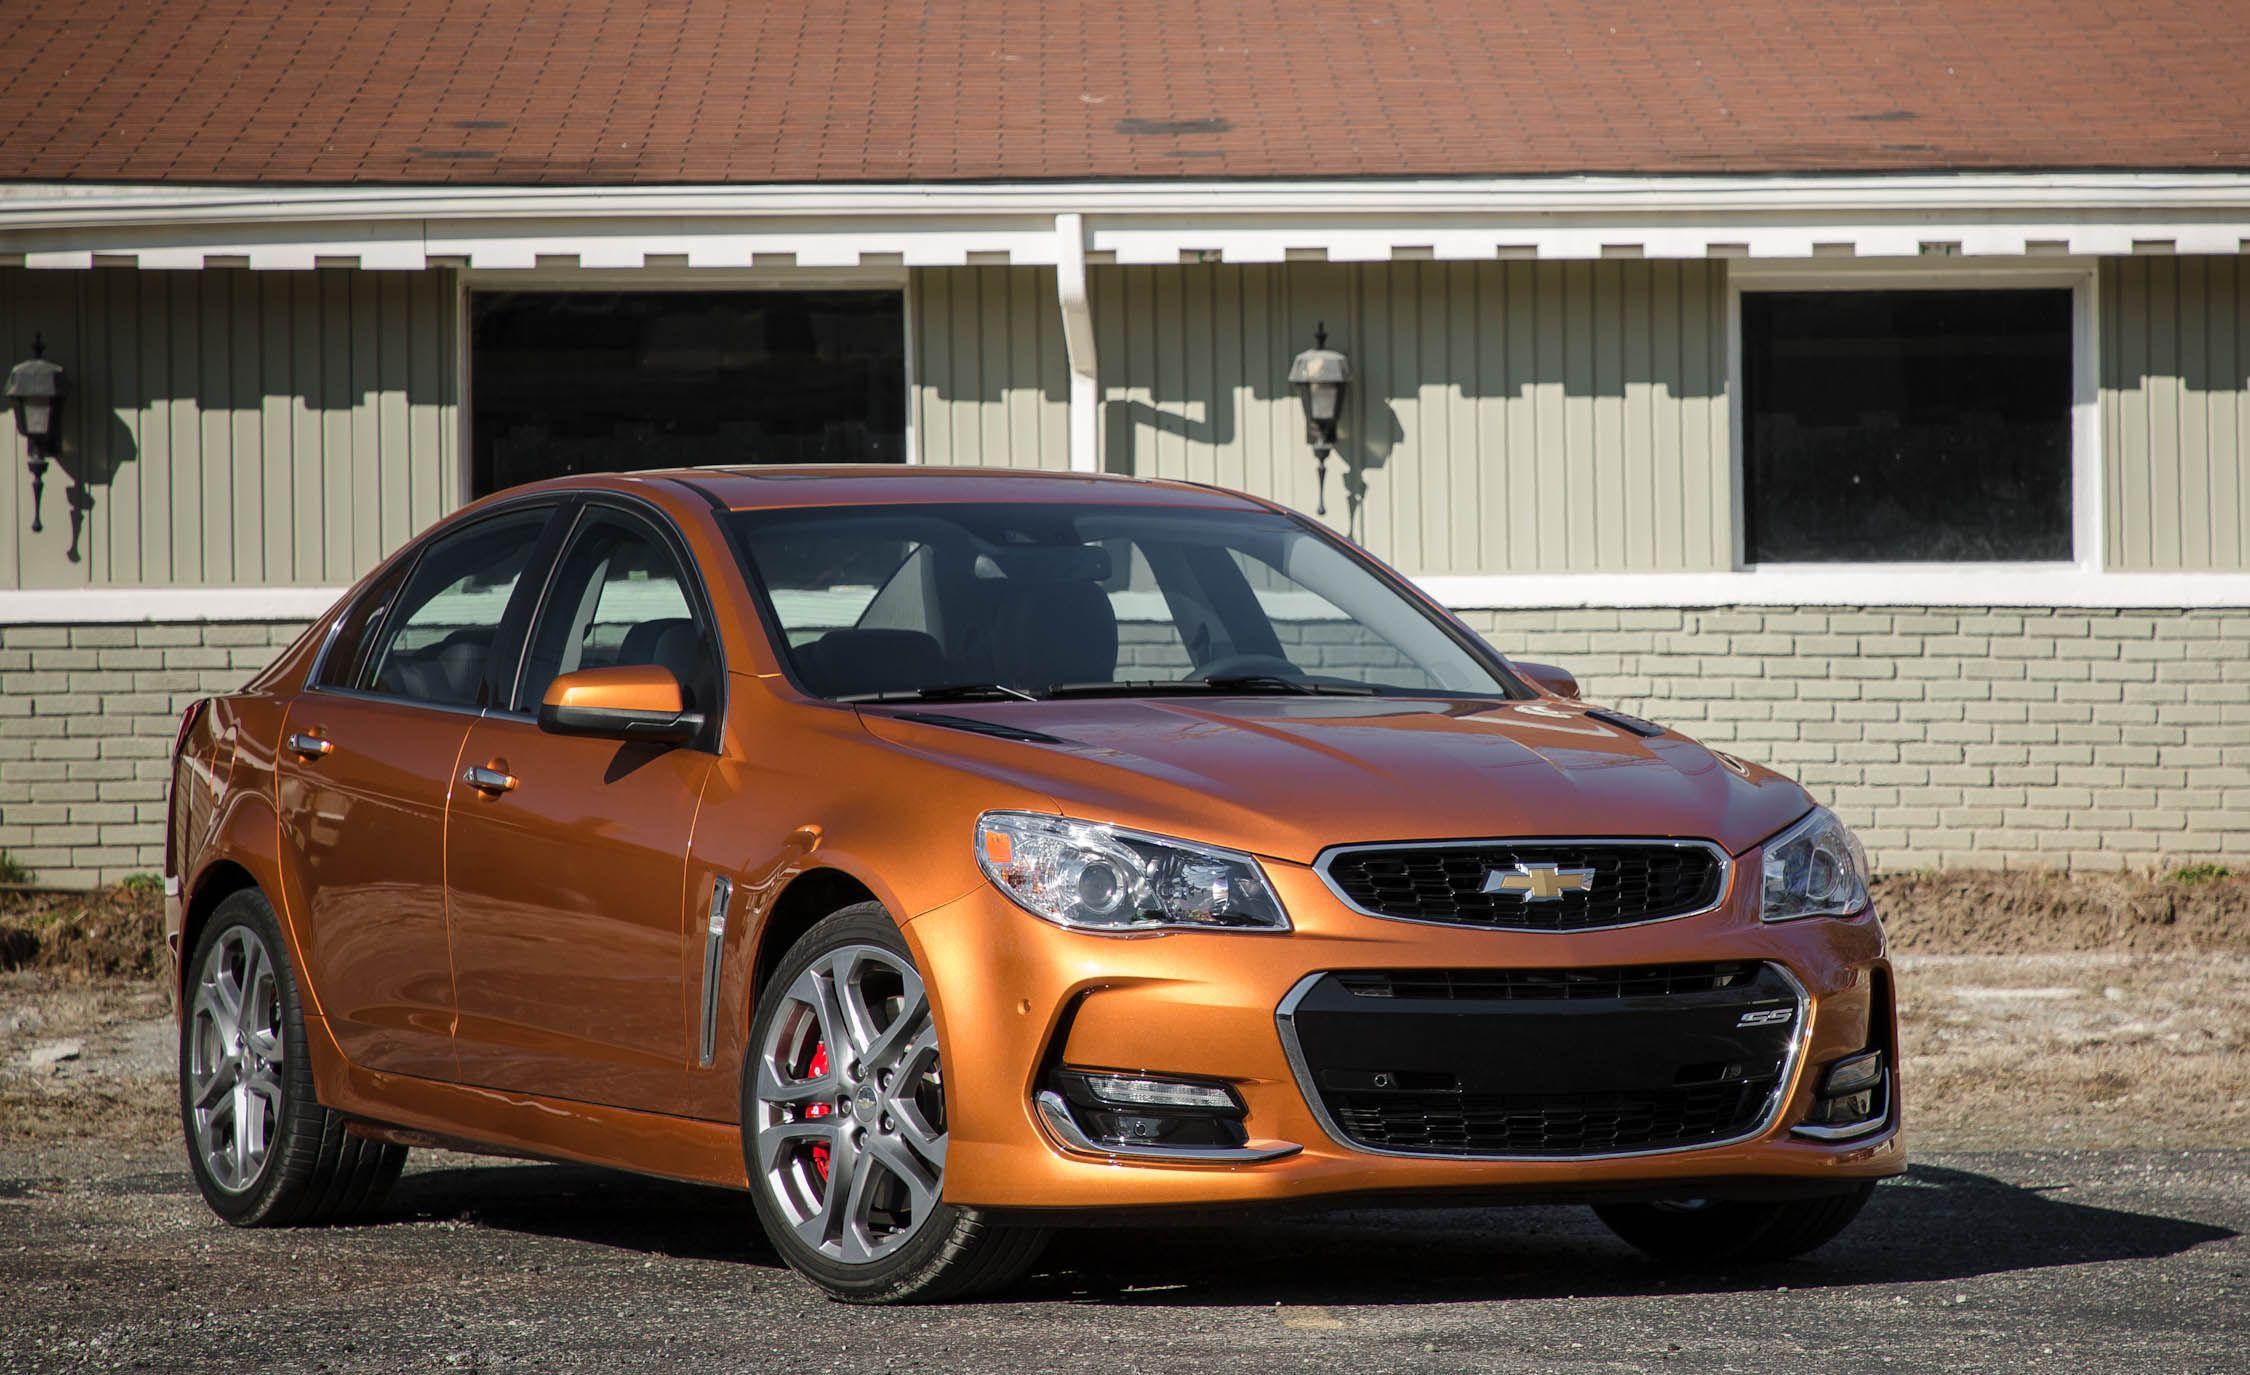 Chevrolet SS Reviews | Chevrolet SS Price, Photos, and Specs | Car ...